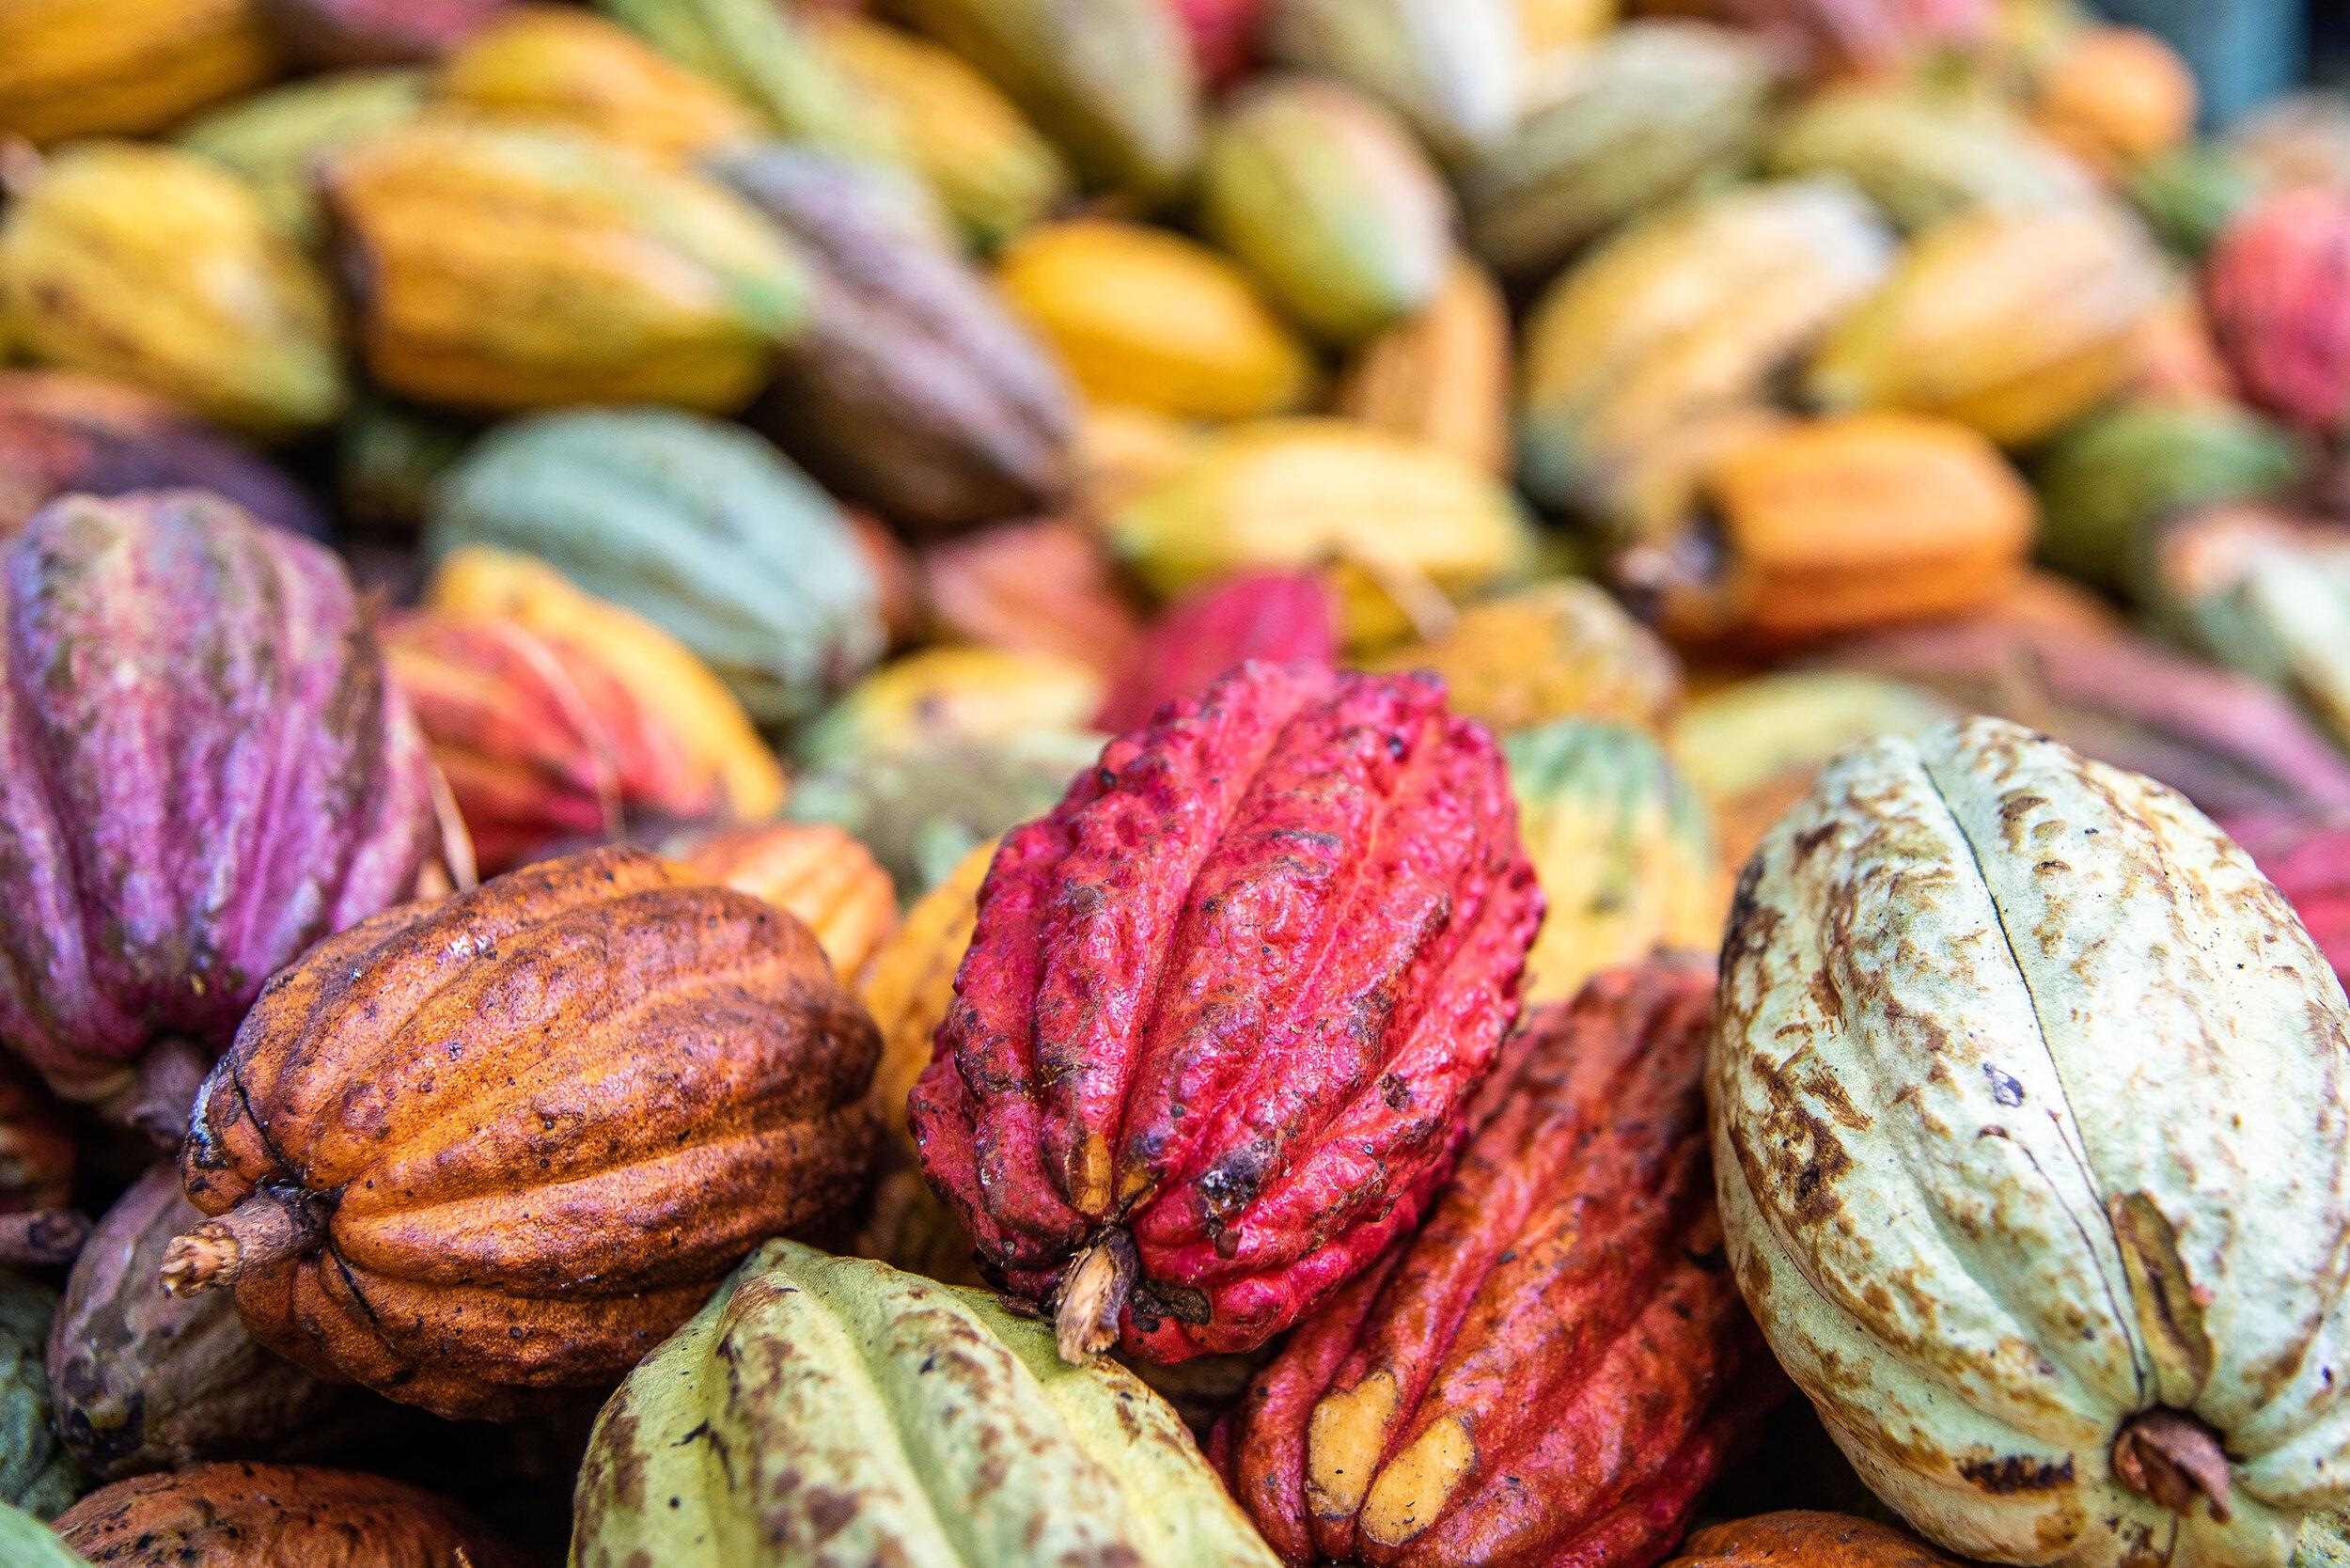 Cacao pods in Madagascar's Sambirano Valley